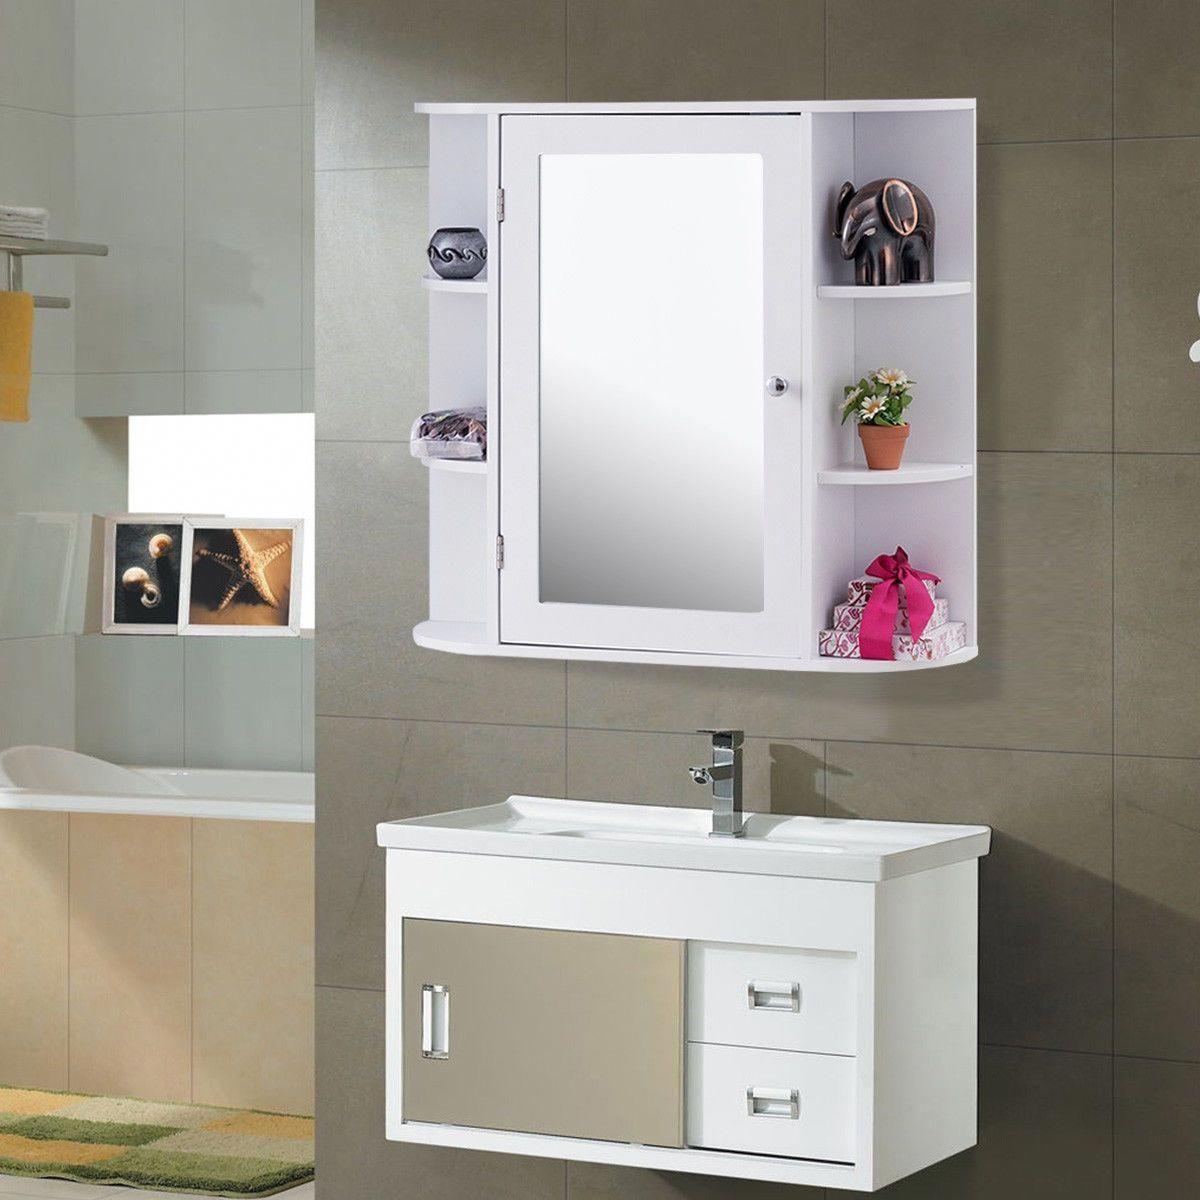 Multipurpose Mount Wall Mirror Bathroom Storage Cabinet Bathroomfurniture Wall Mounted Bathroom Cabinets Mirror Wall Bathroom Wood Bathroom Vanity